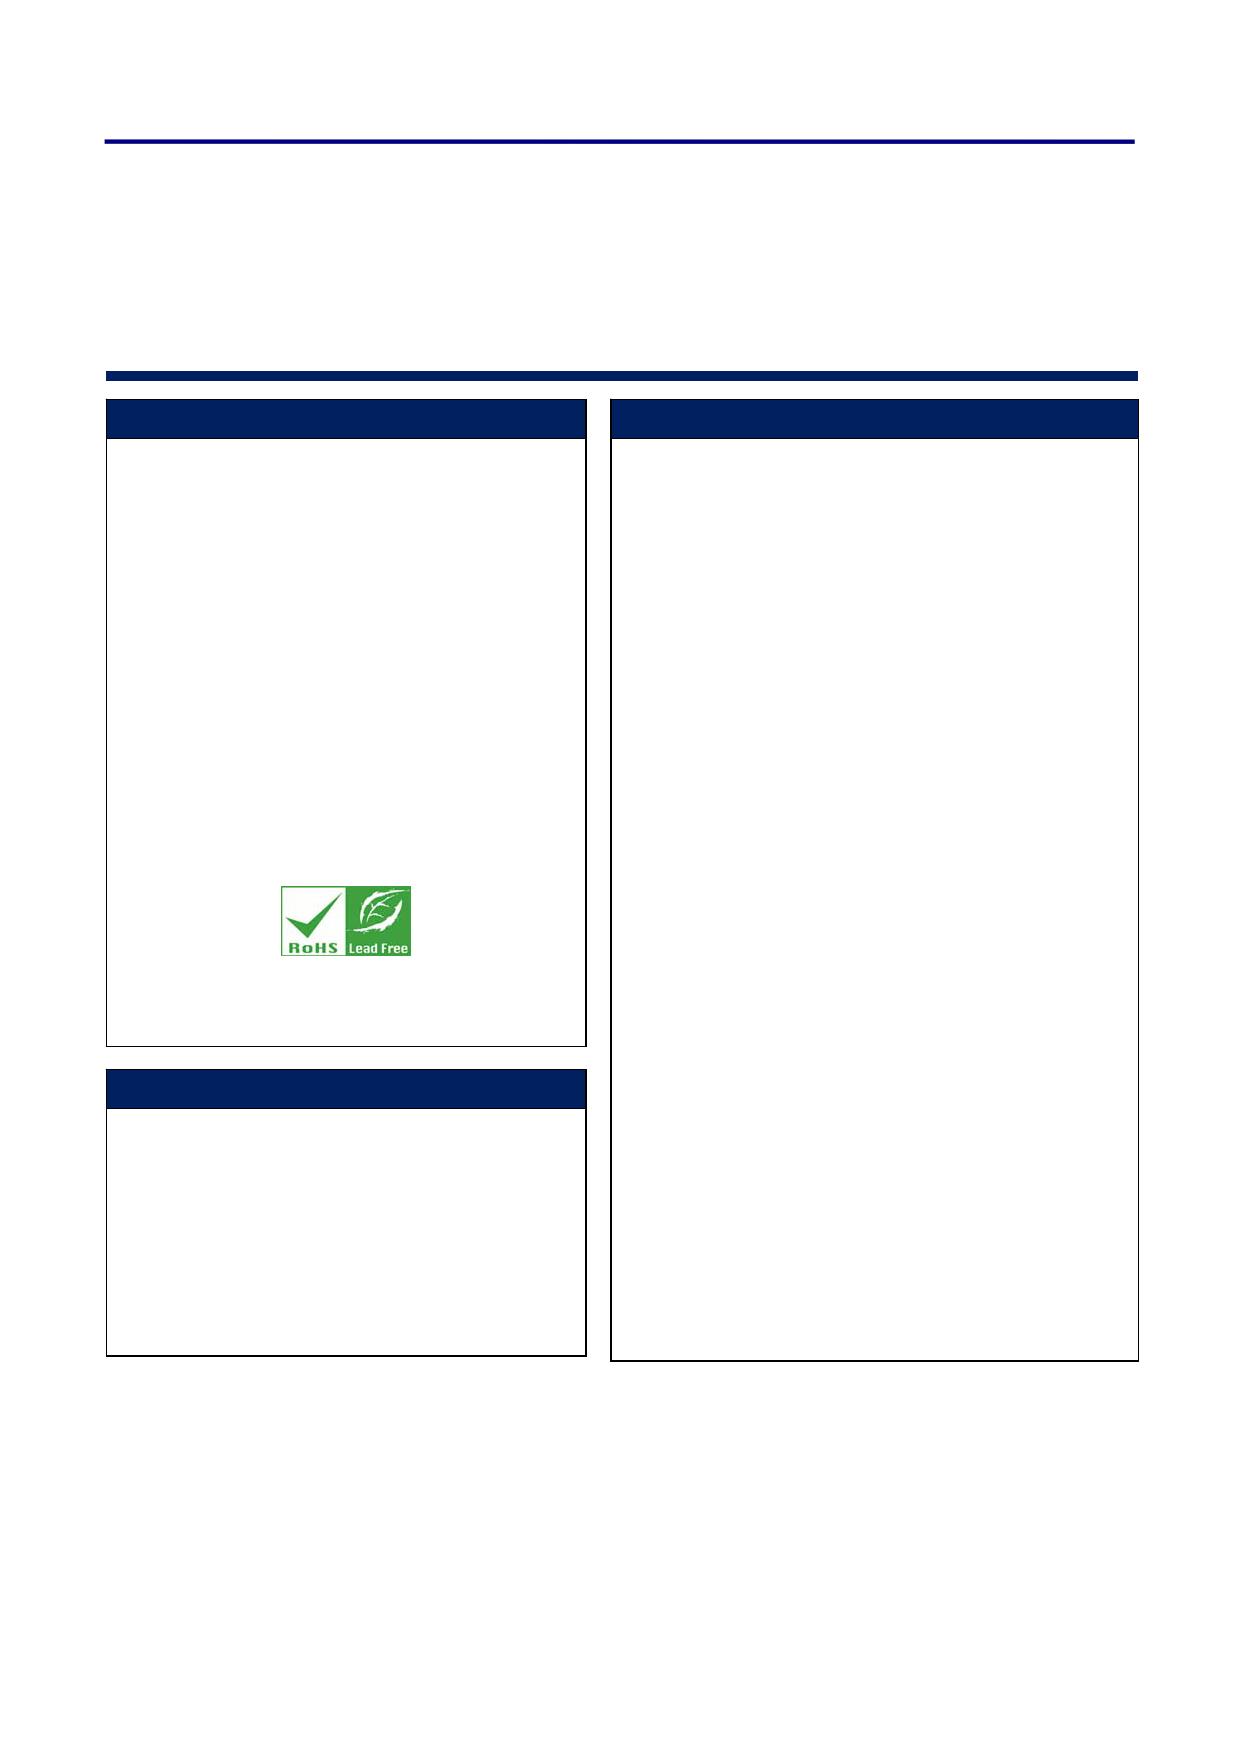 LT8900 datasheet pinout